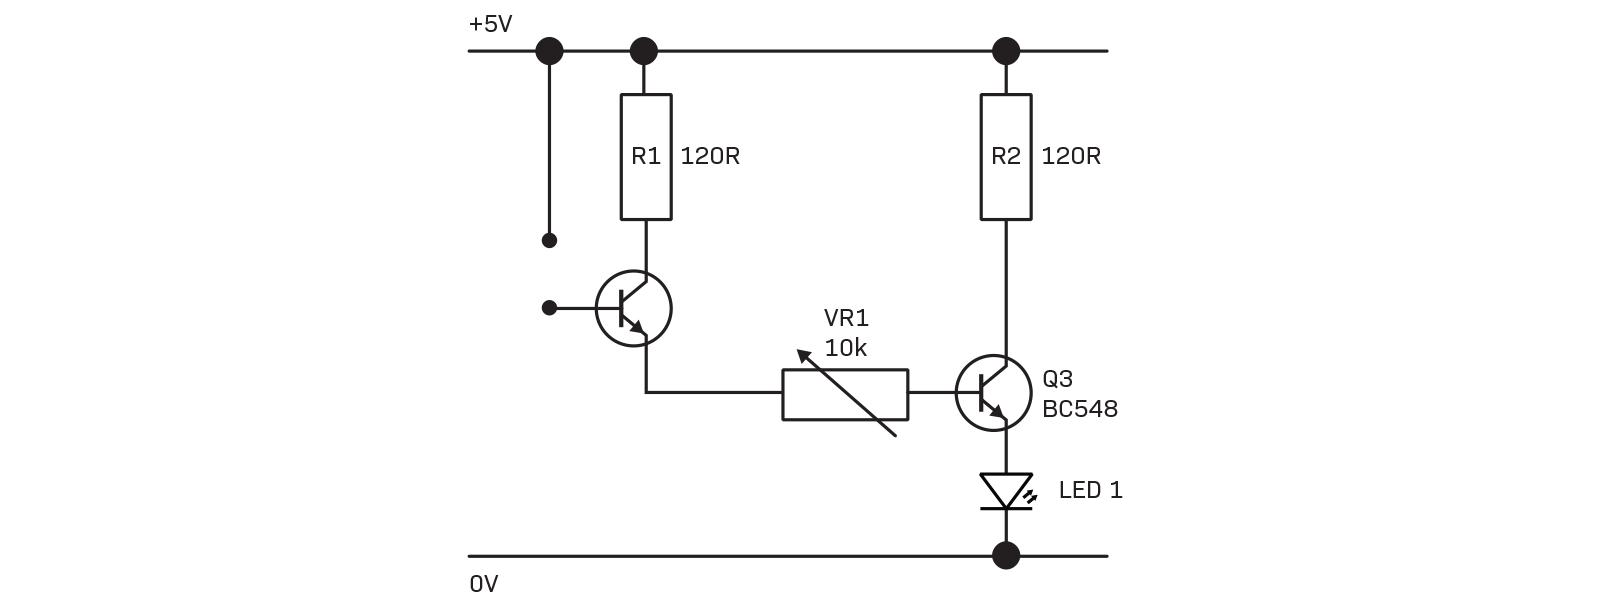 Satisfying Needs With Sensors Diyode Magazine Circuits Plant Soil Moisture Tester Circuit Sensor Alarm Resistive Touch Pad